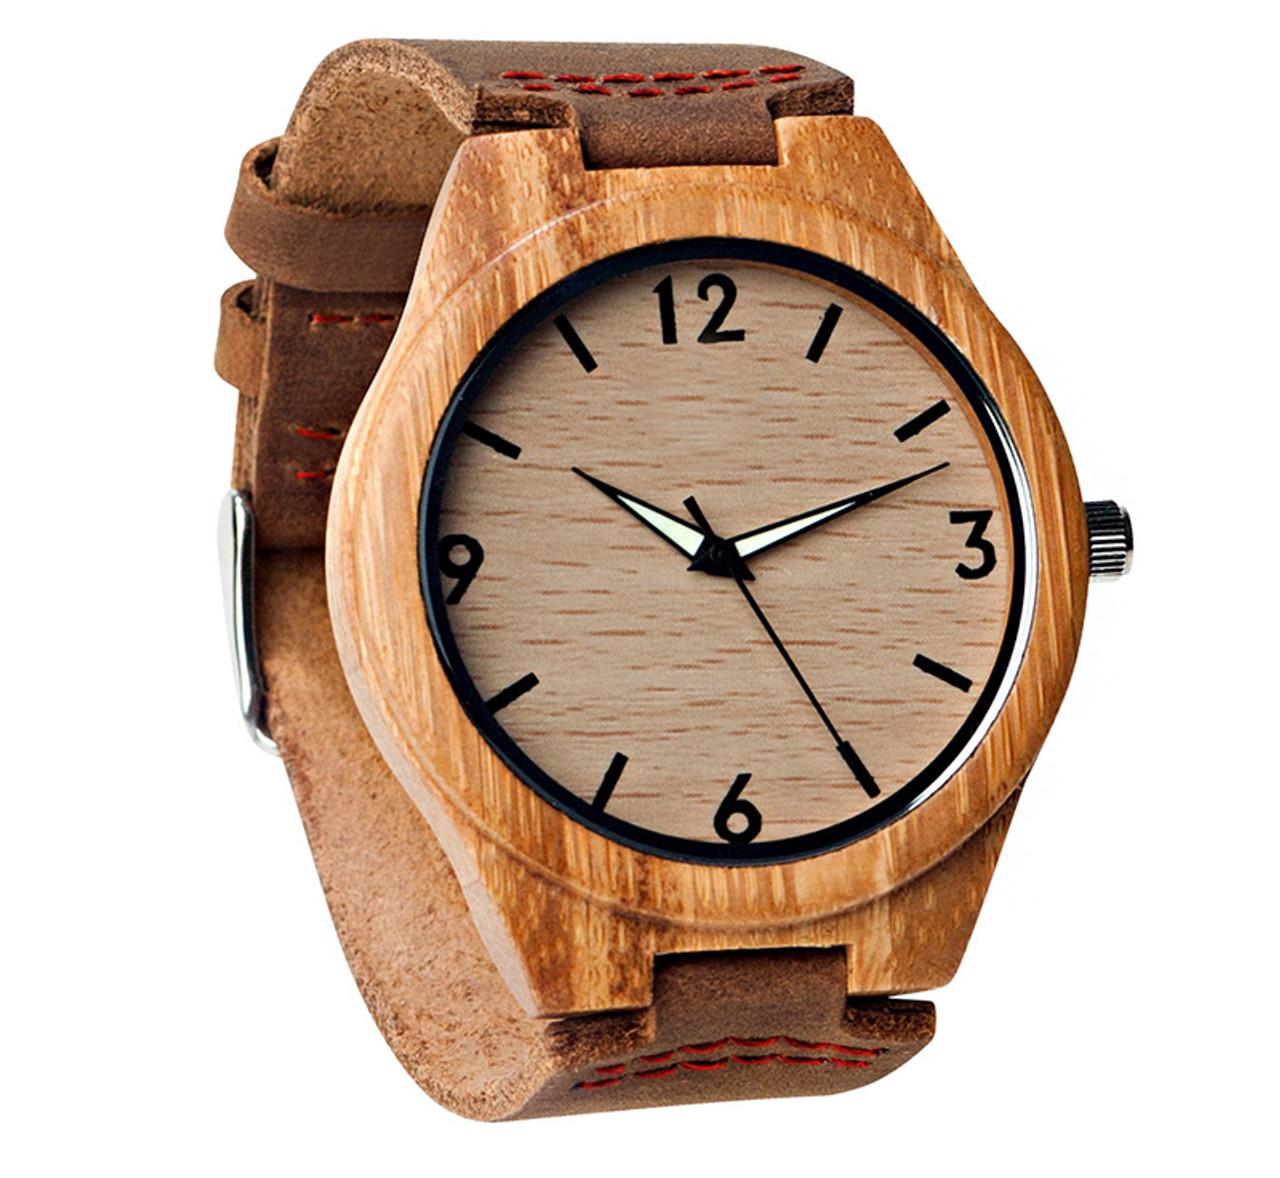 GRPN Italy - Wood Engraved Watch Glow Dials W#68 - Aura